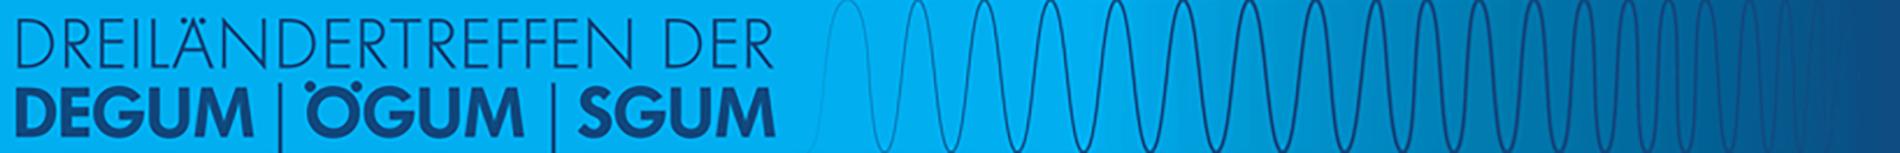 Ultrasound 2016